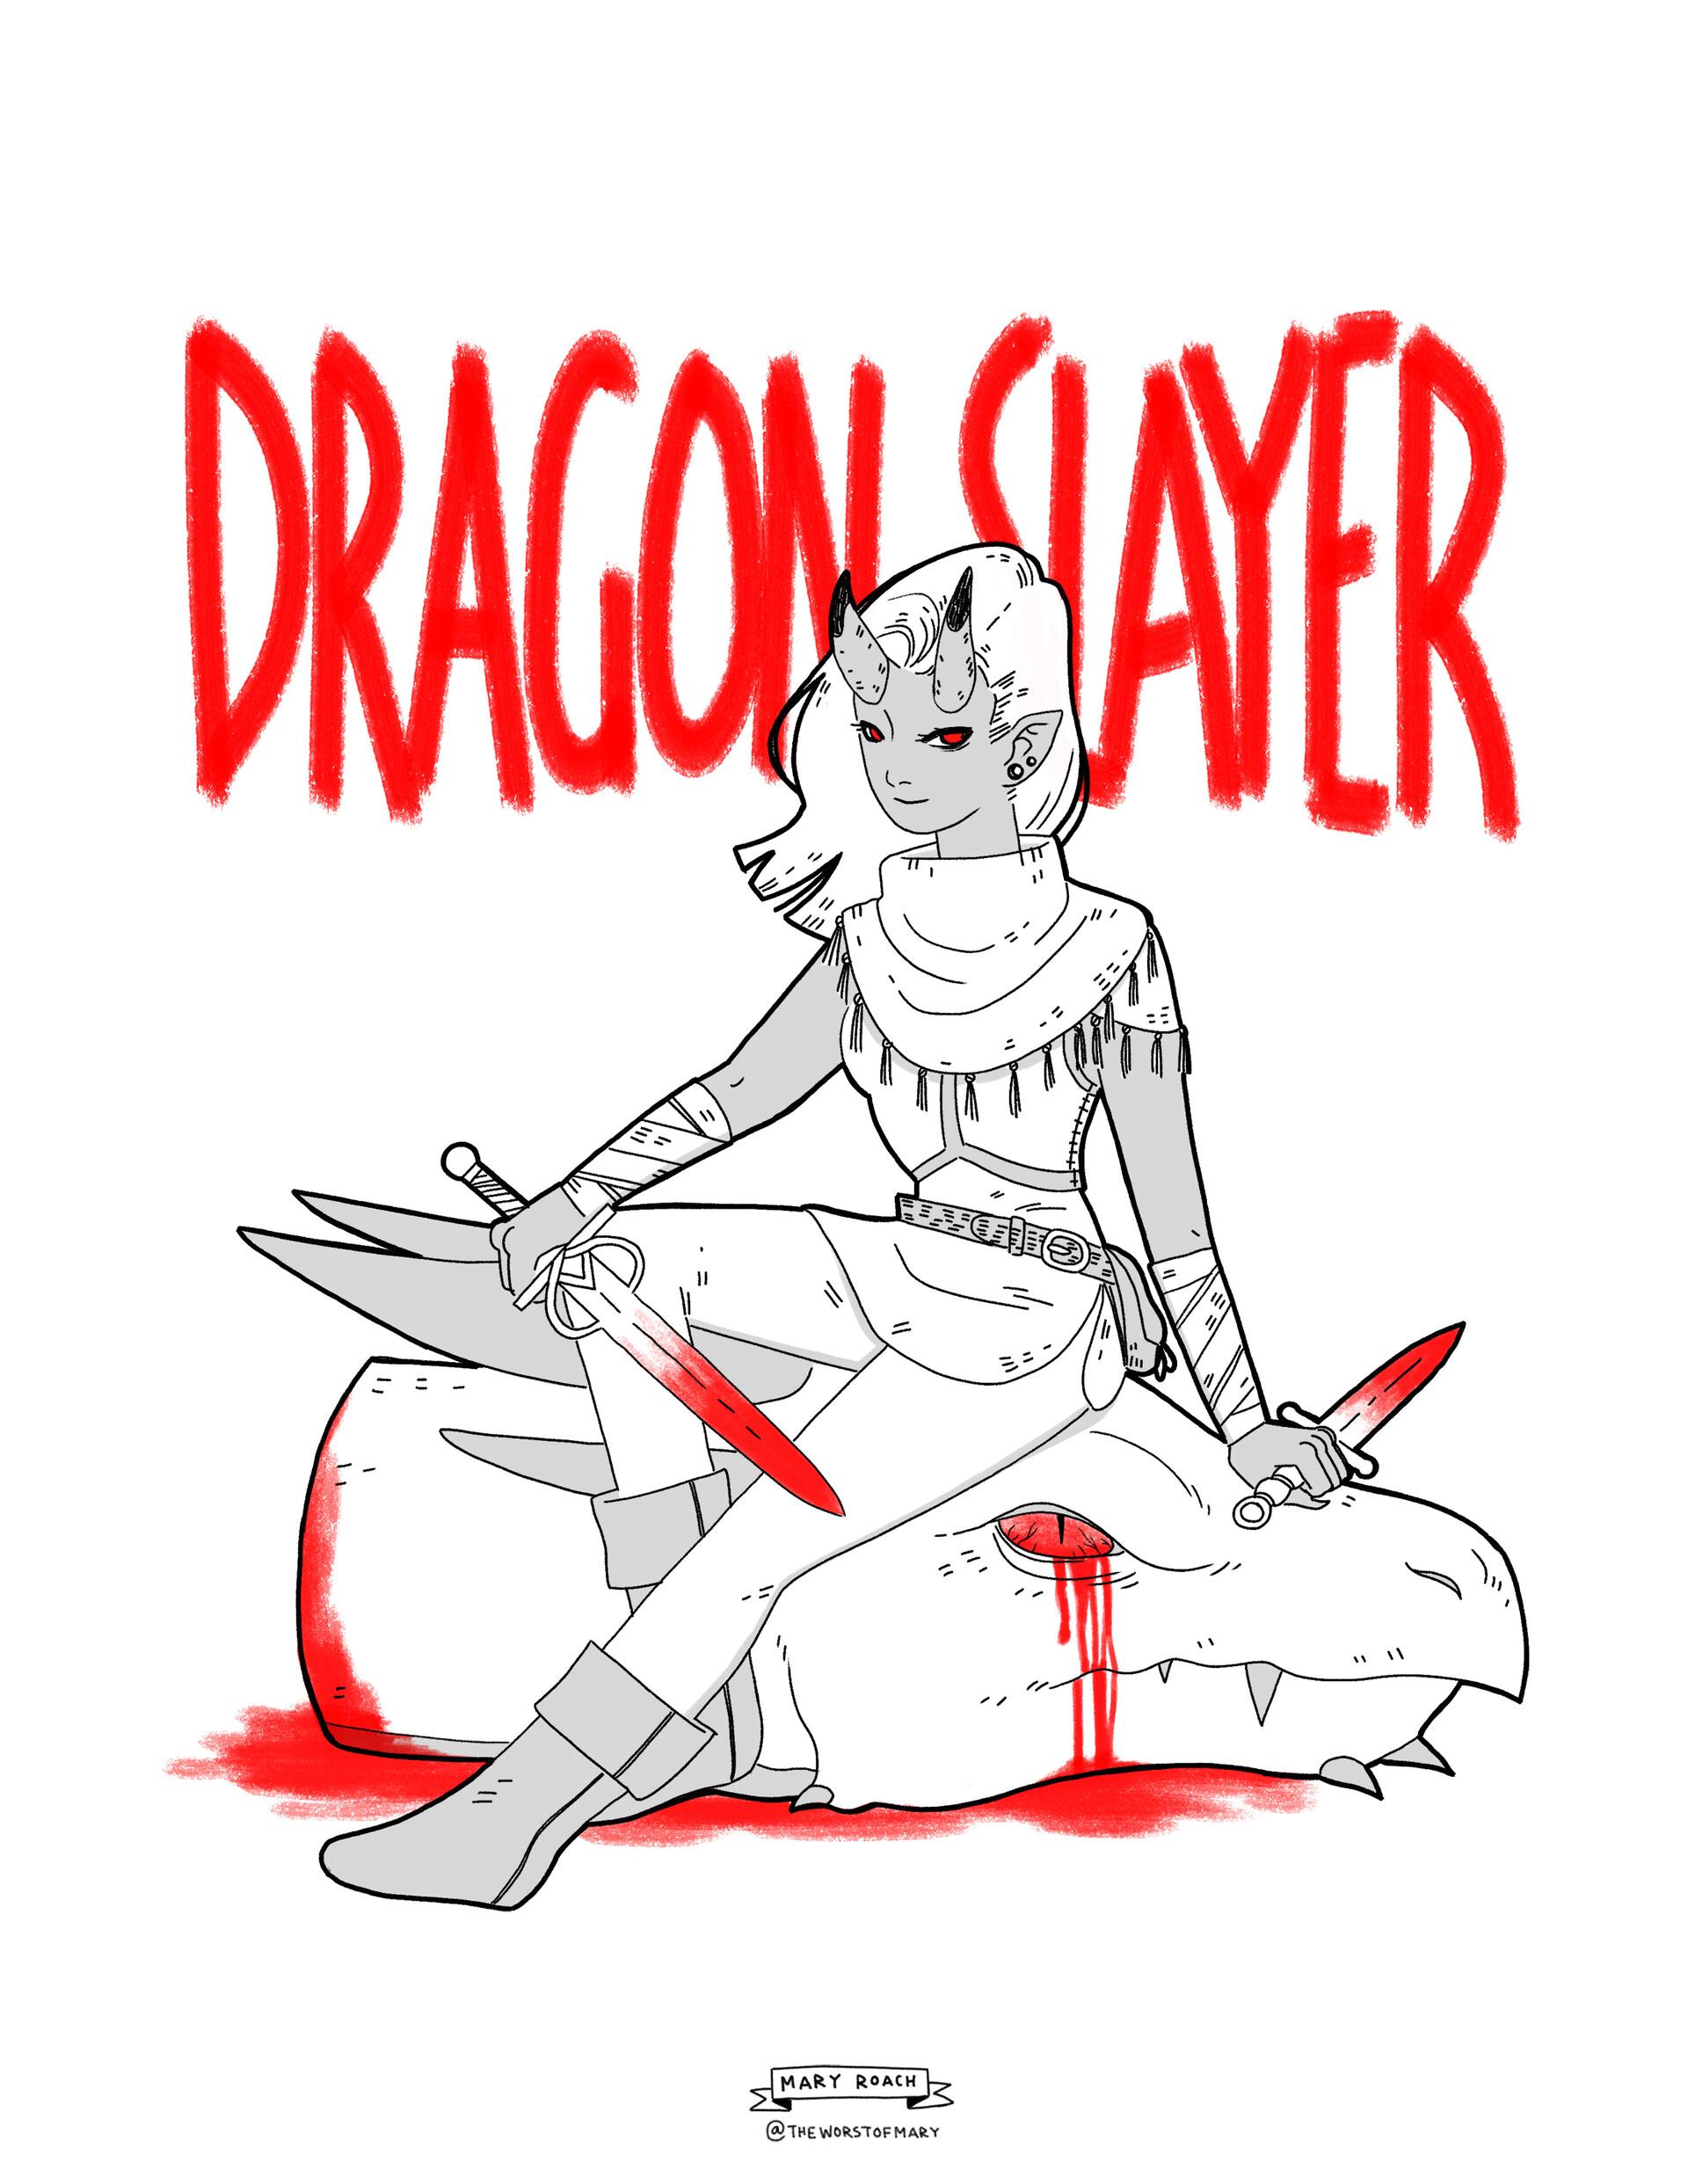 Mary roach dragonslayer3